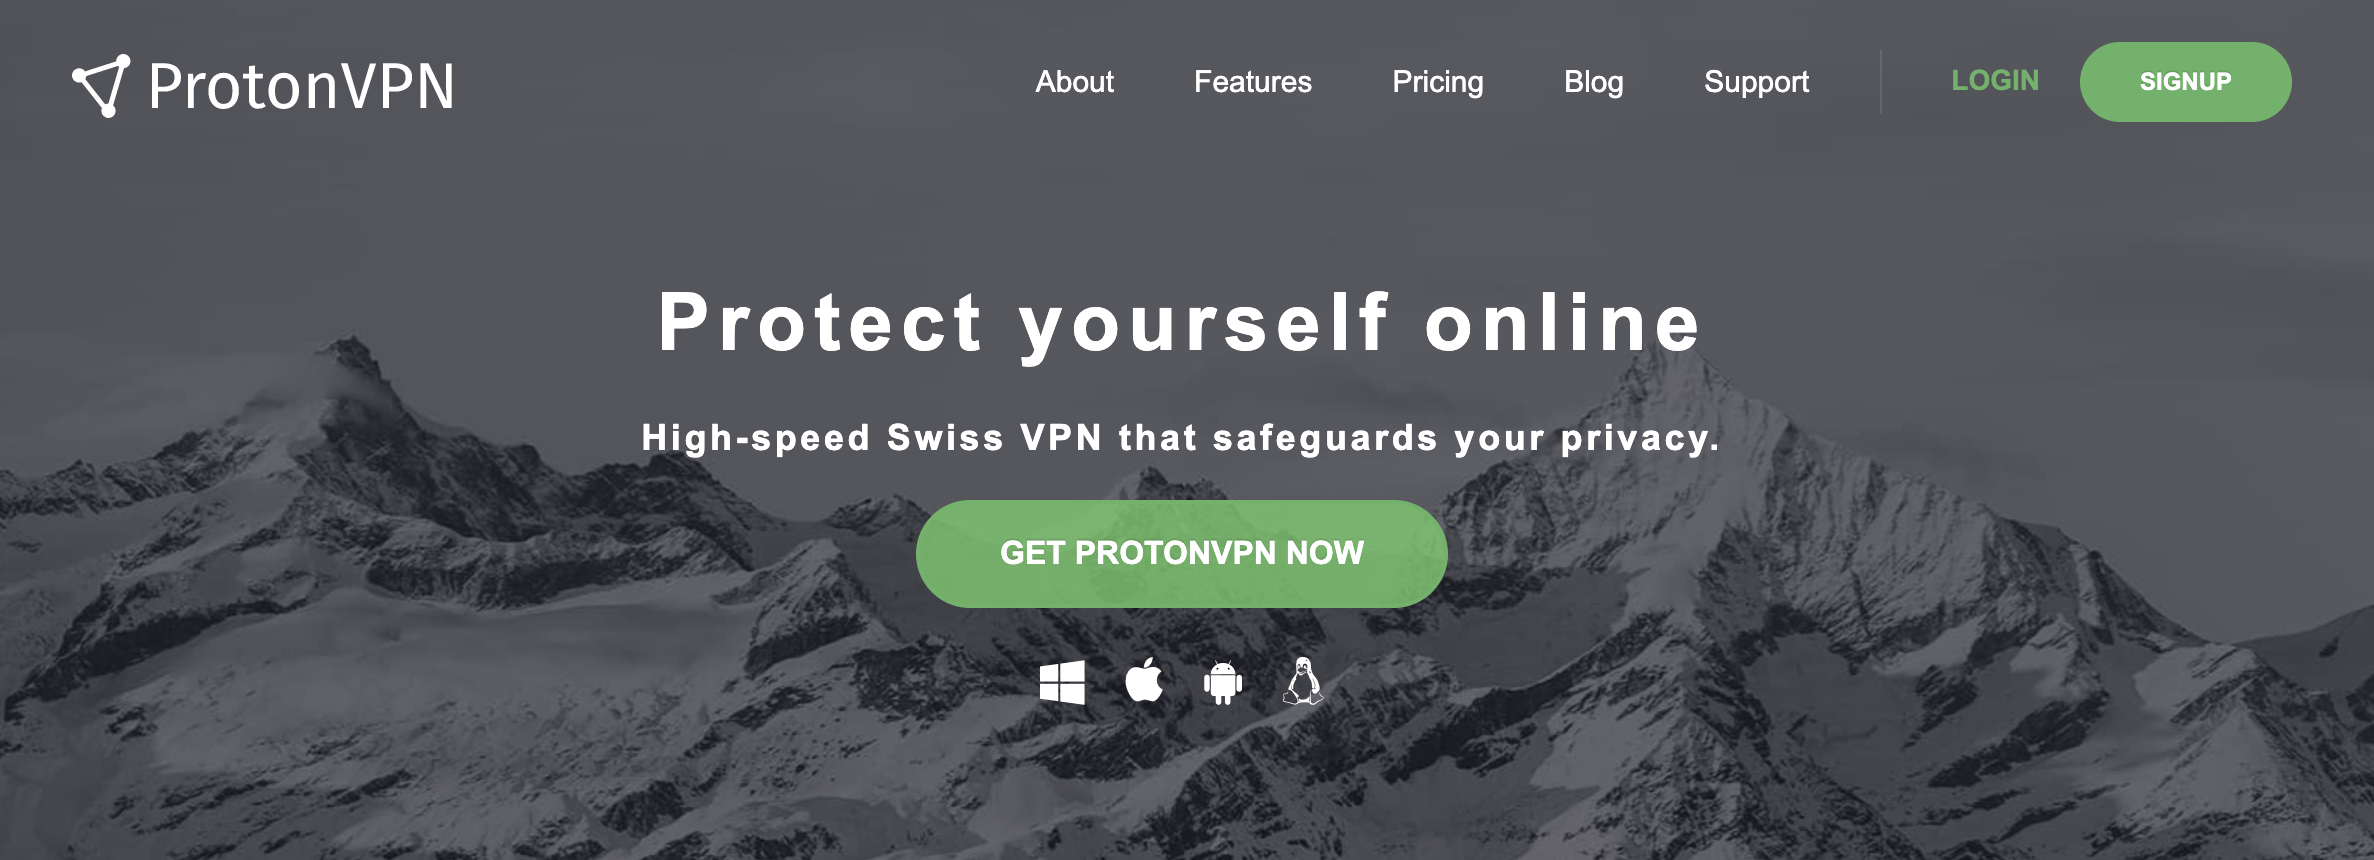 ProtonVPN - best vpn services